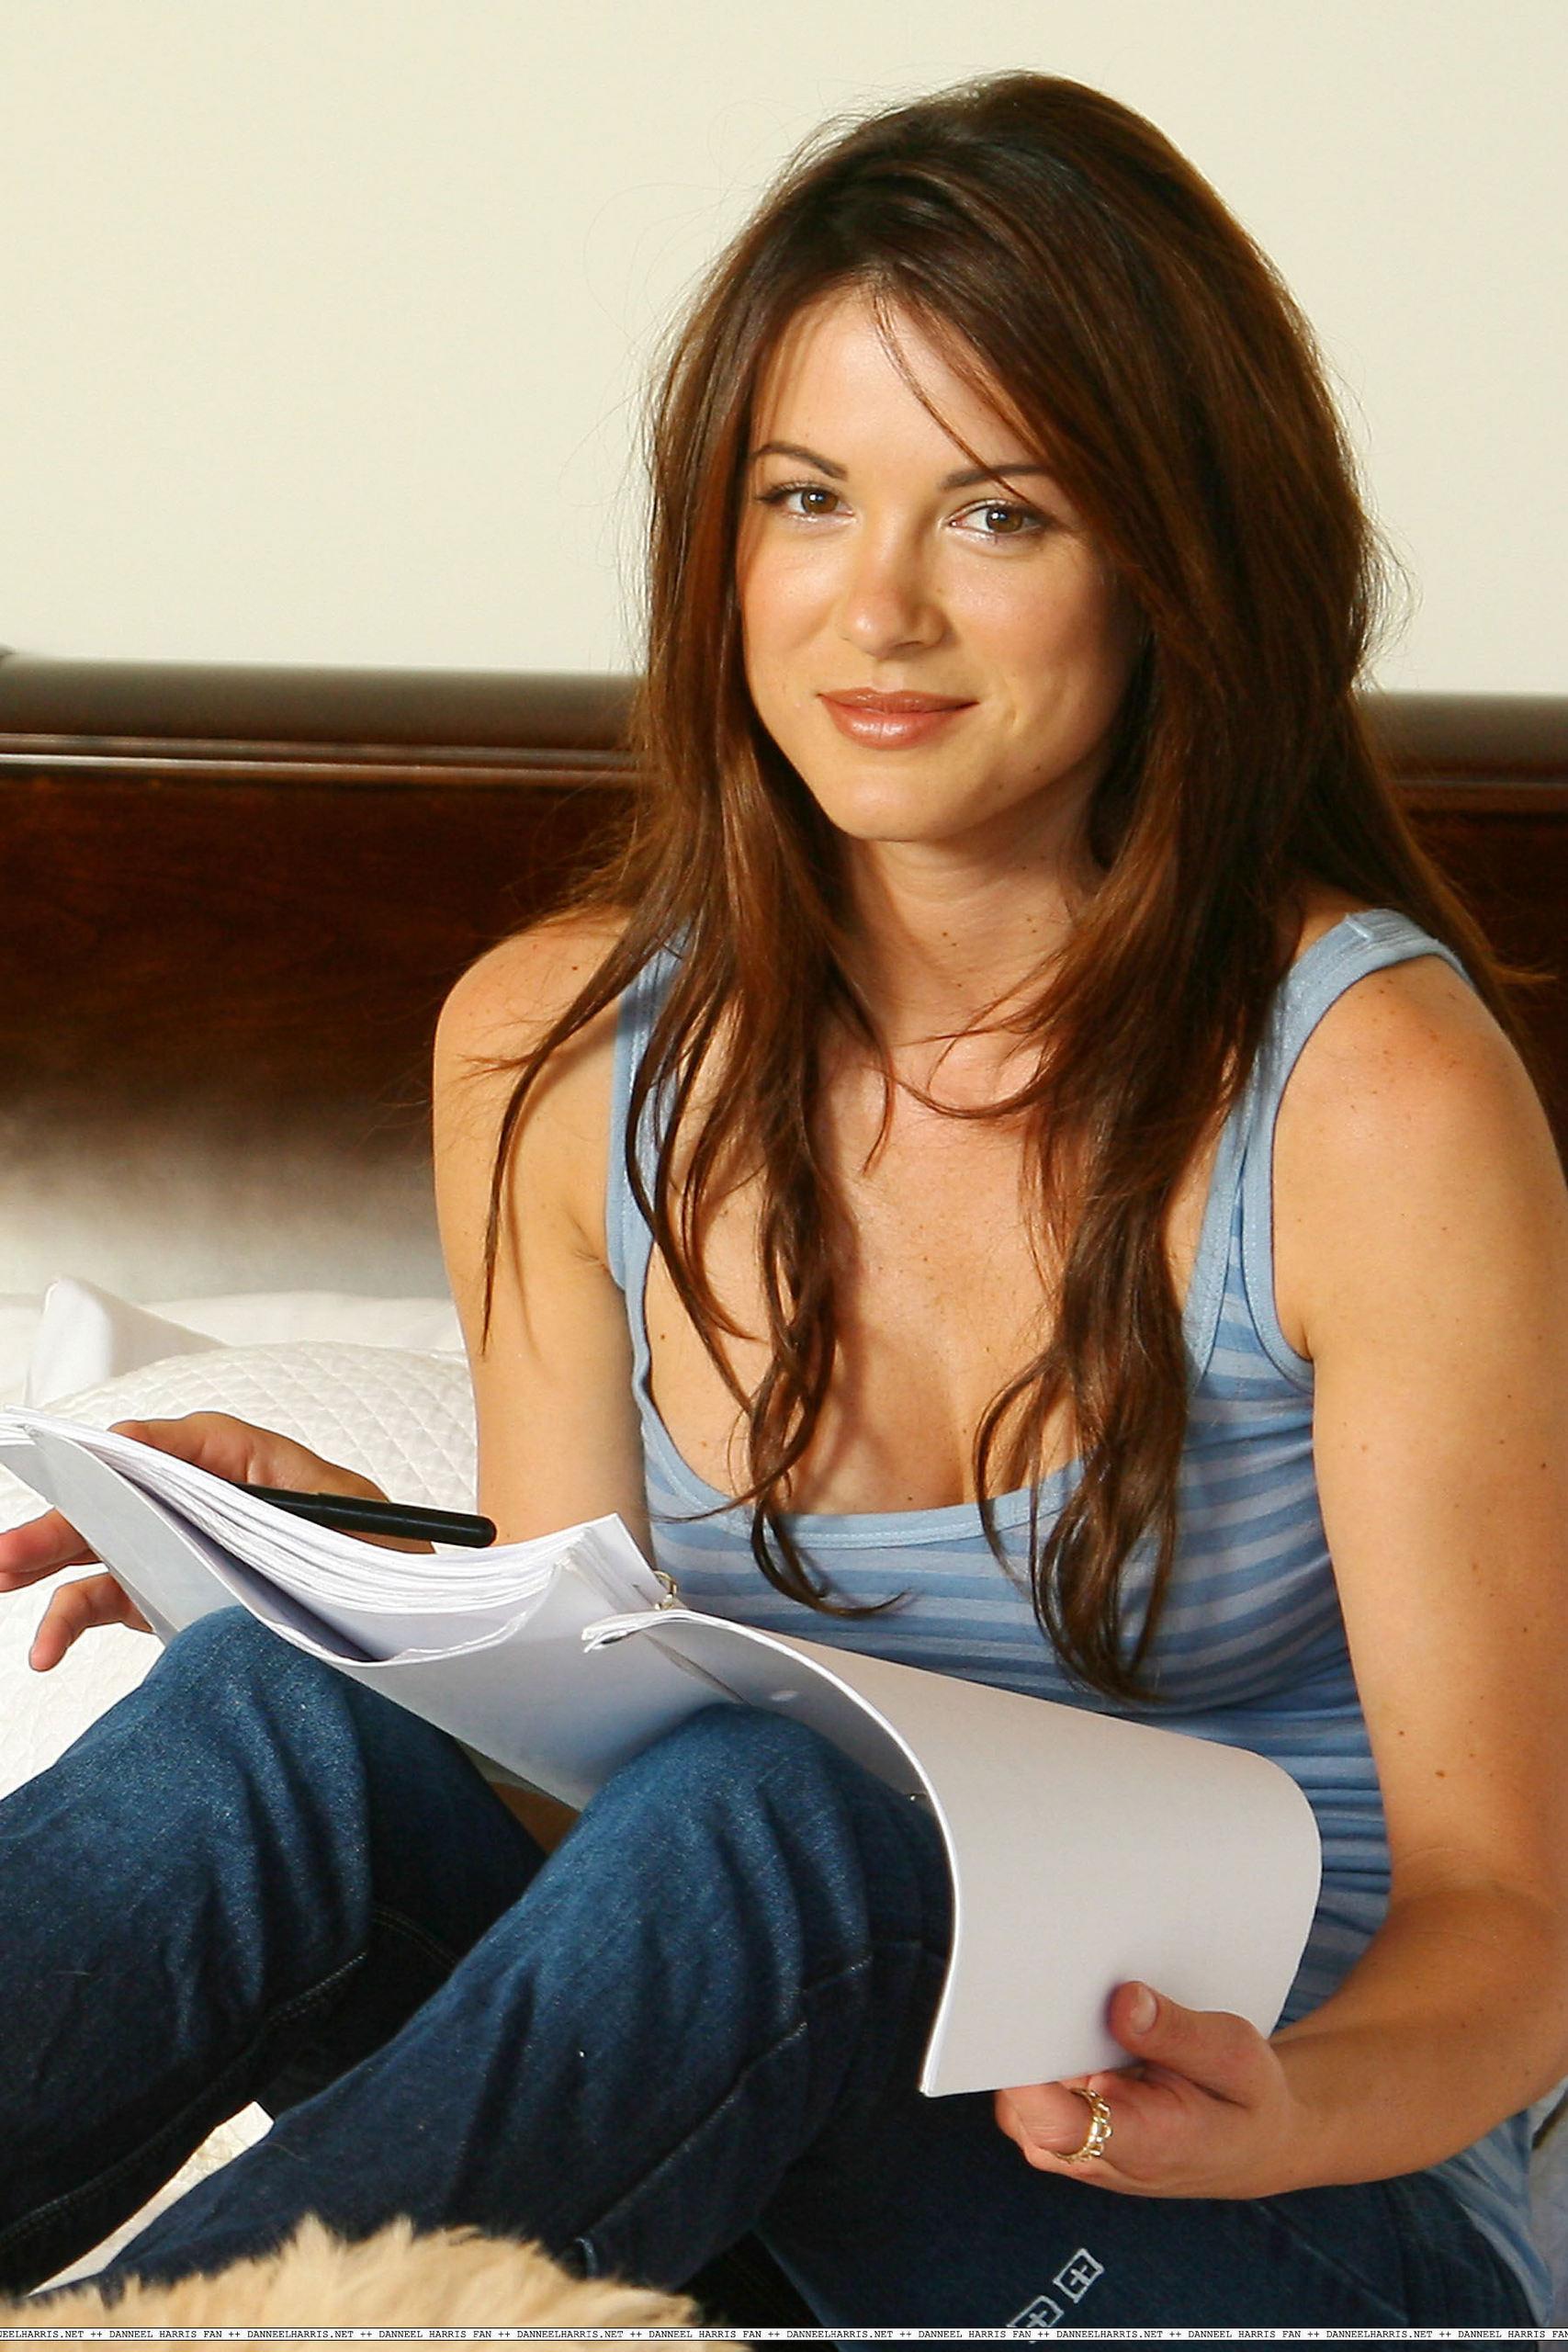 Ann Christy,Amy Hargreaves Porno pics Jolene Anderson born May 26, 1980 (age 38),Alona Alegre (b. 1947)